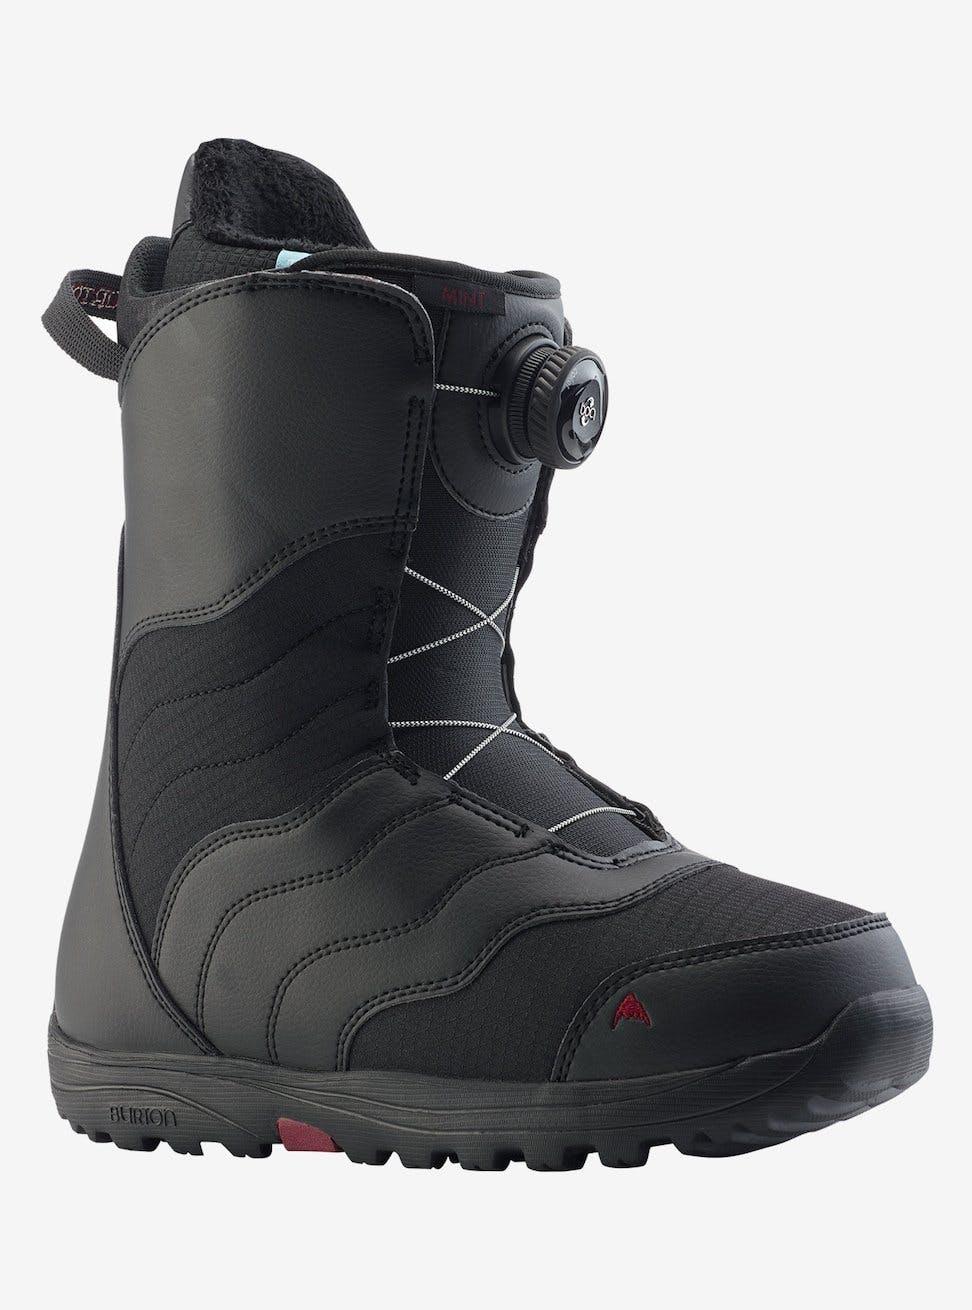 Burton Mint BOA Snowboard Boots · 2021